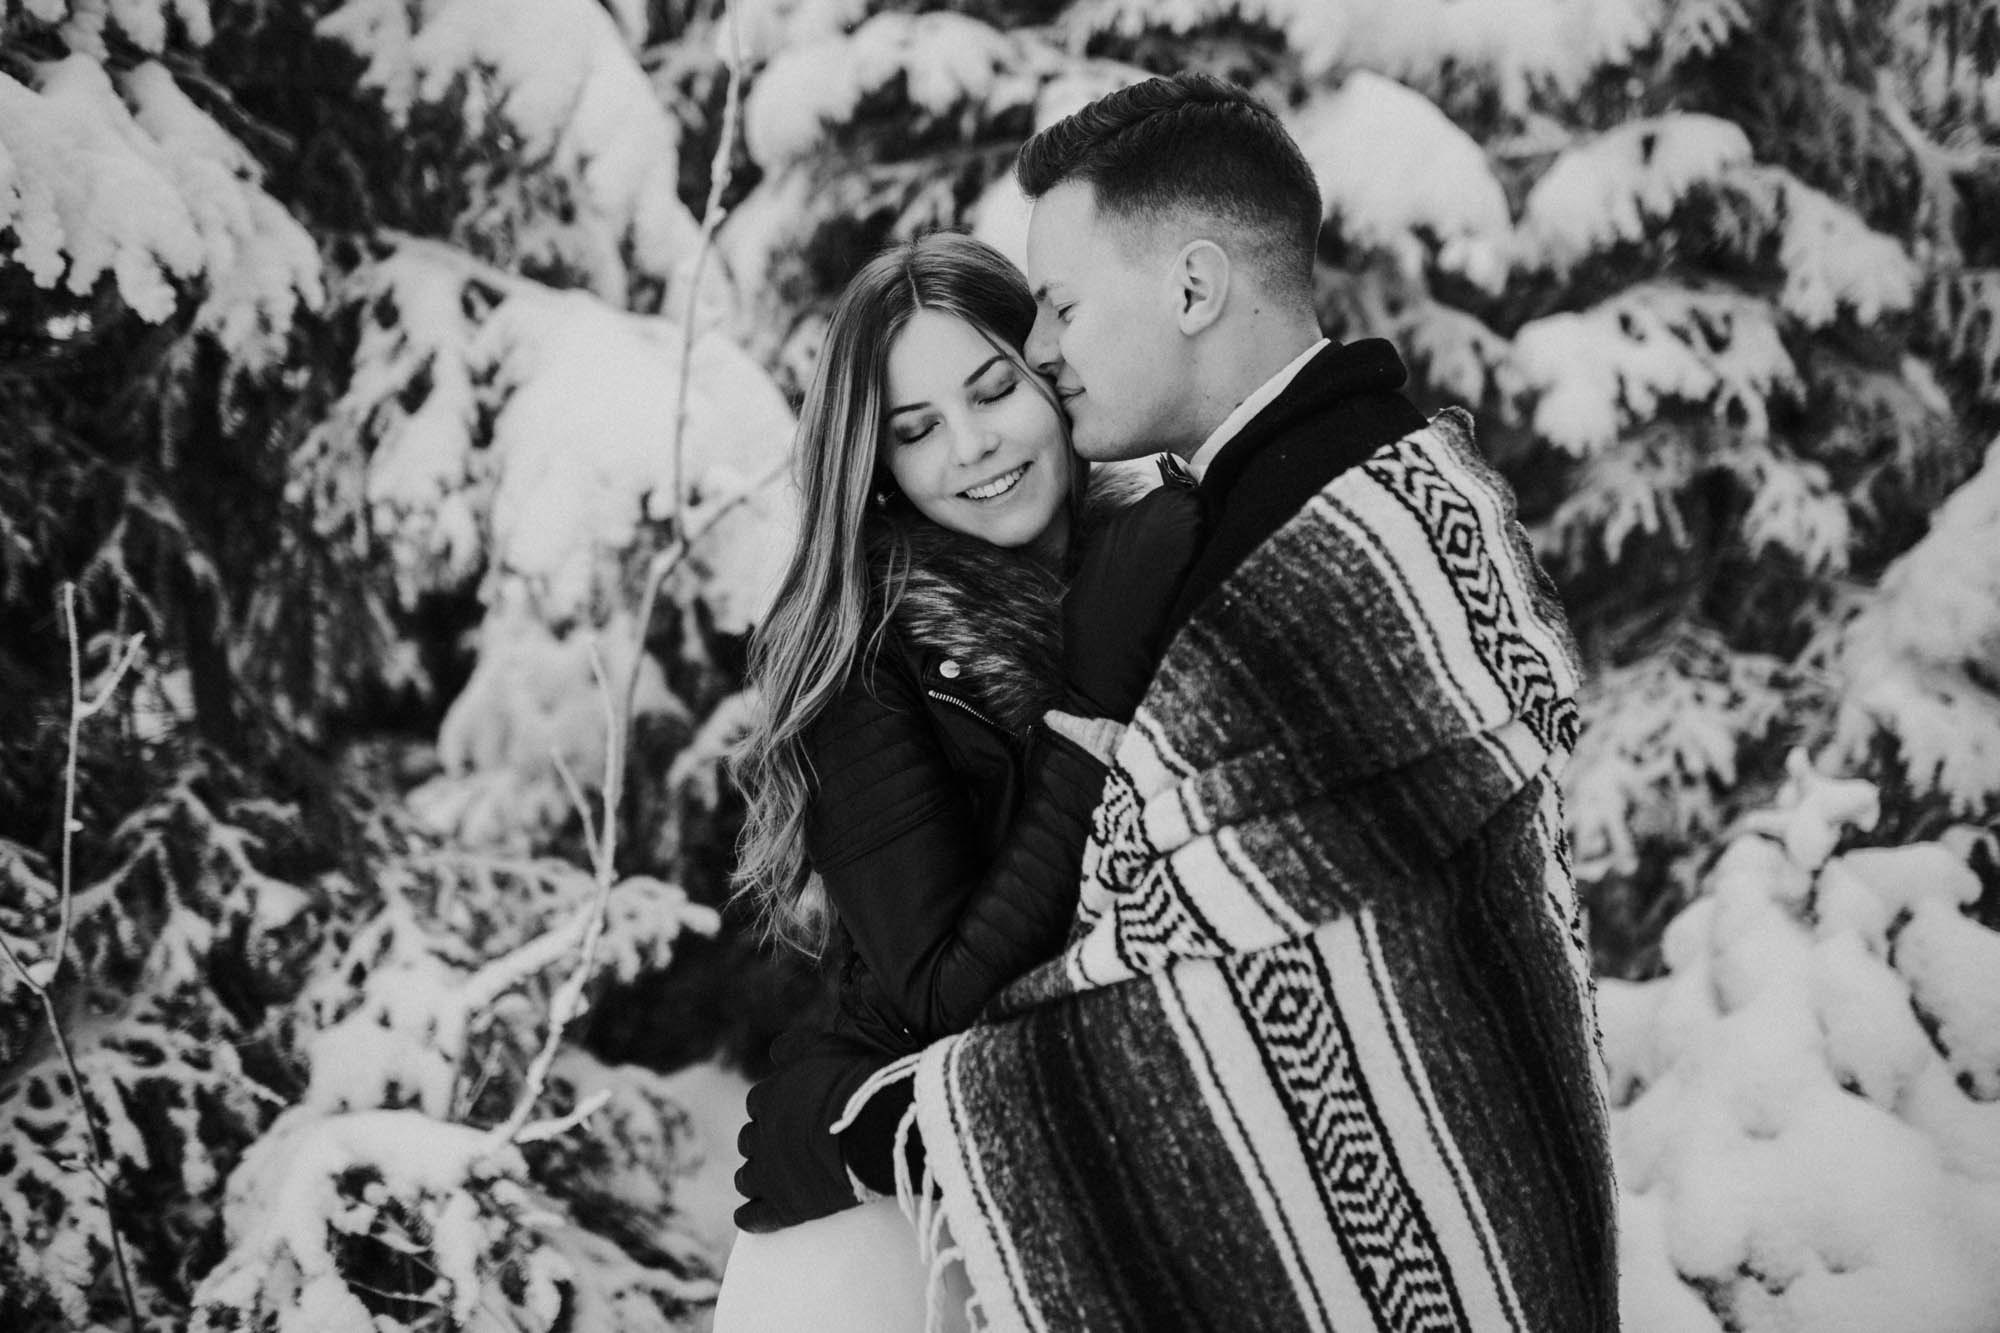 ashley_schulman_photography-winter_wedding_tampere-34.jpg